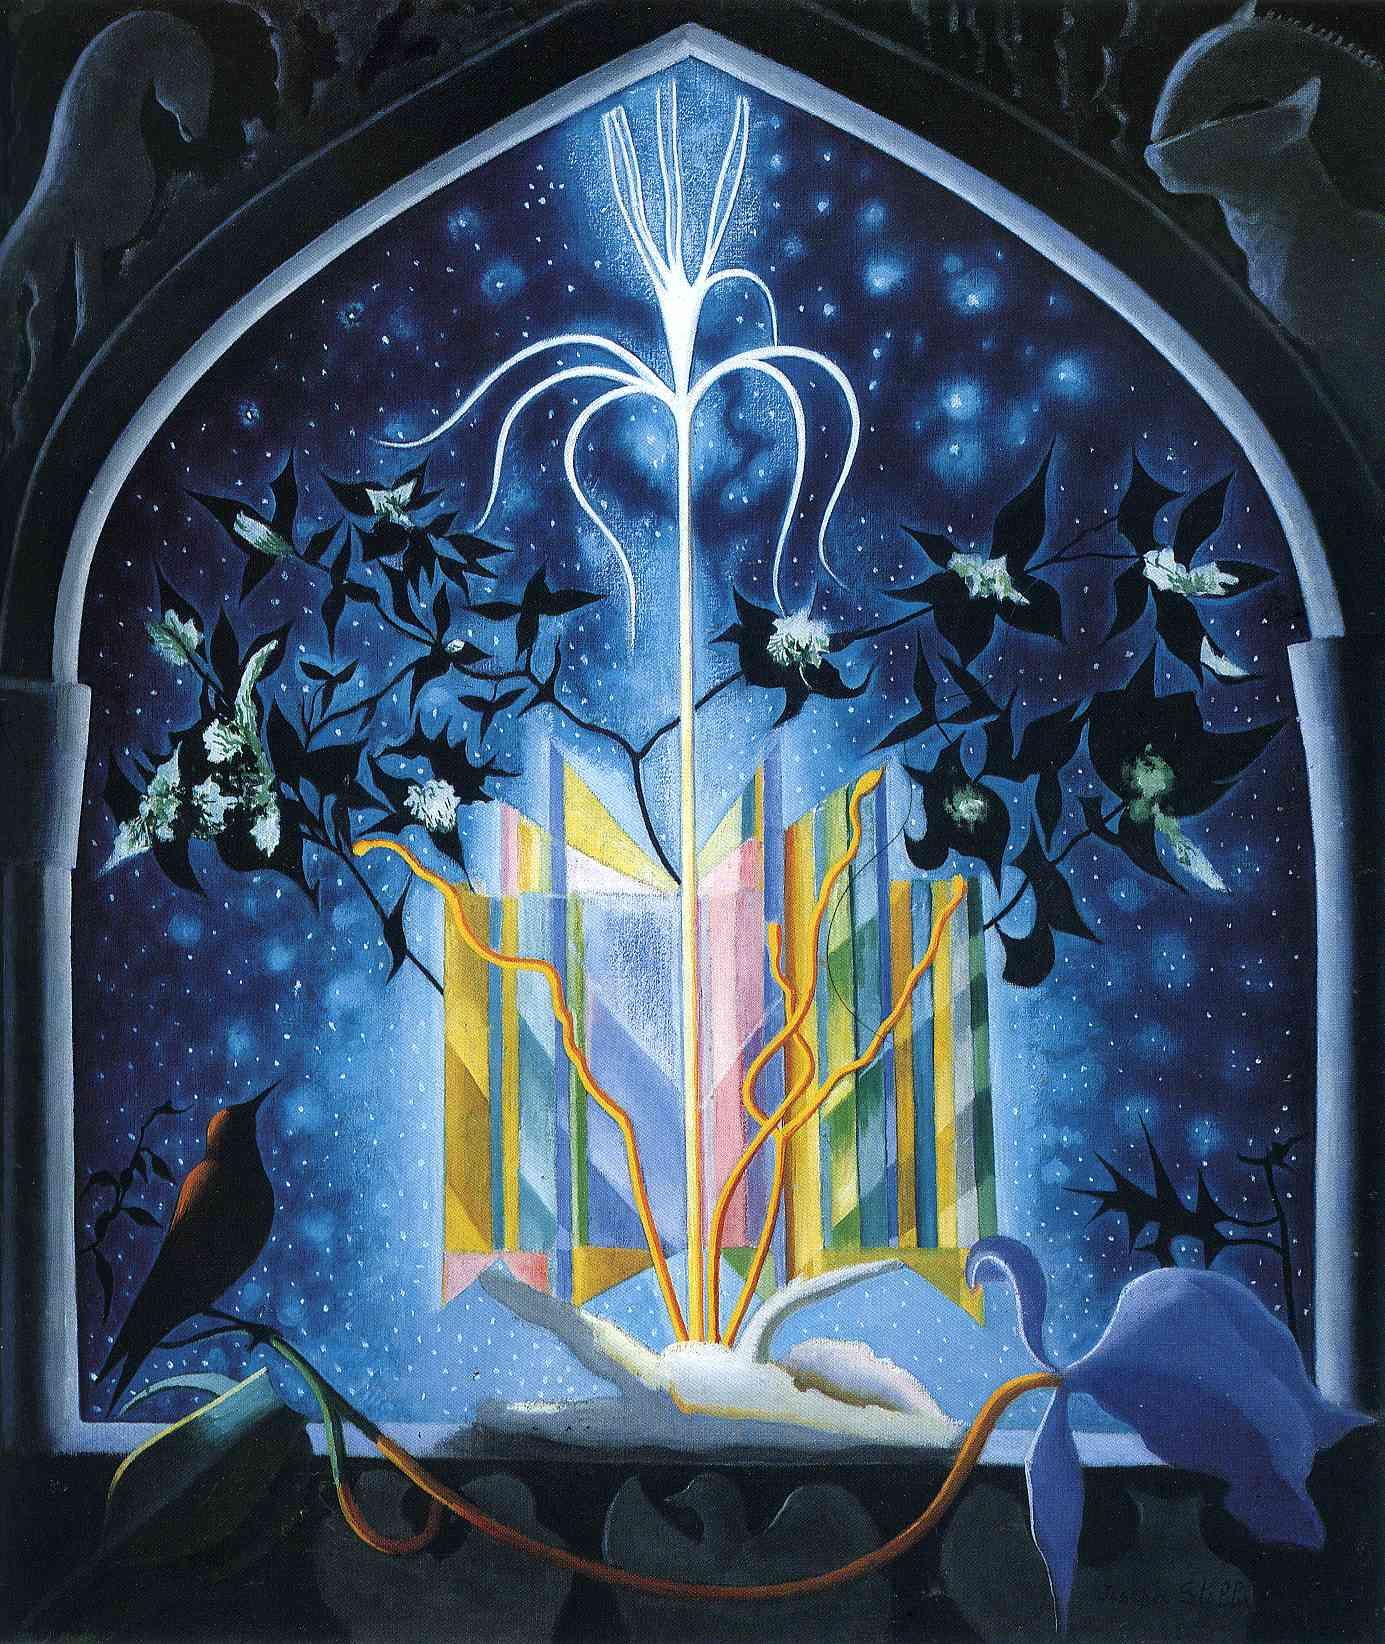 Serenade, A Christmas Fantasy - Joseph Stella - WikiArt.org